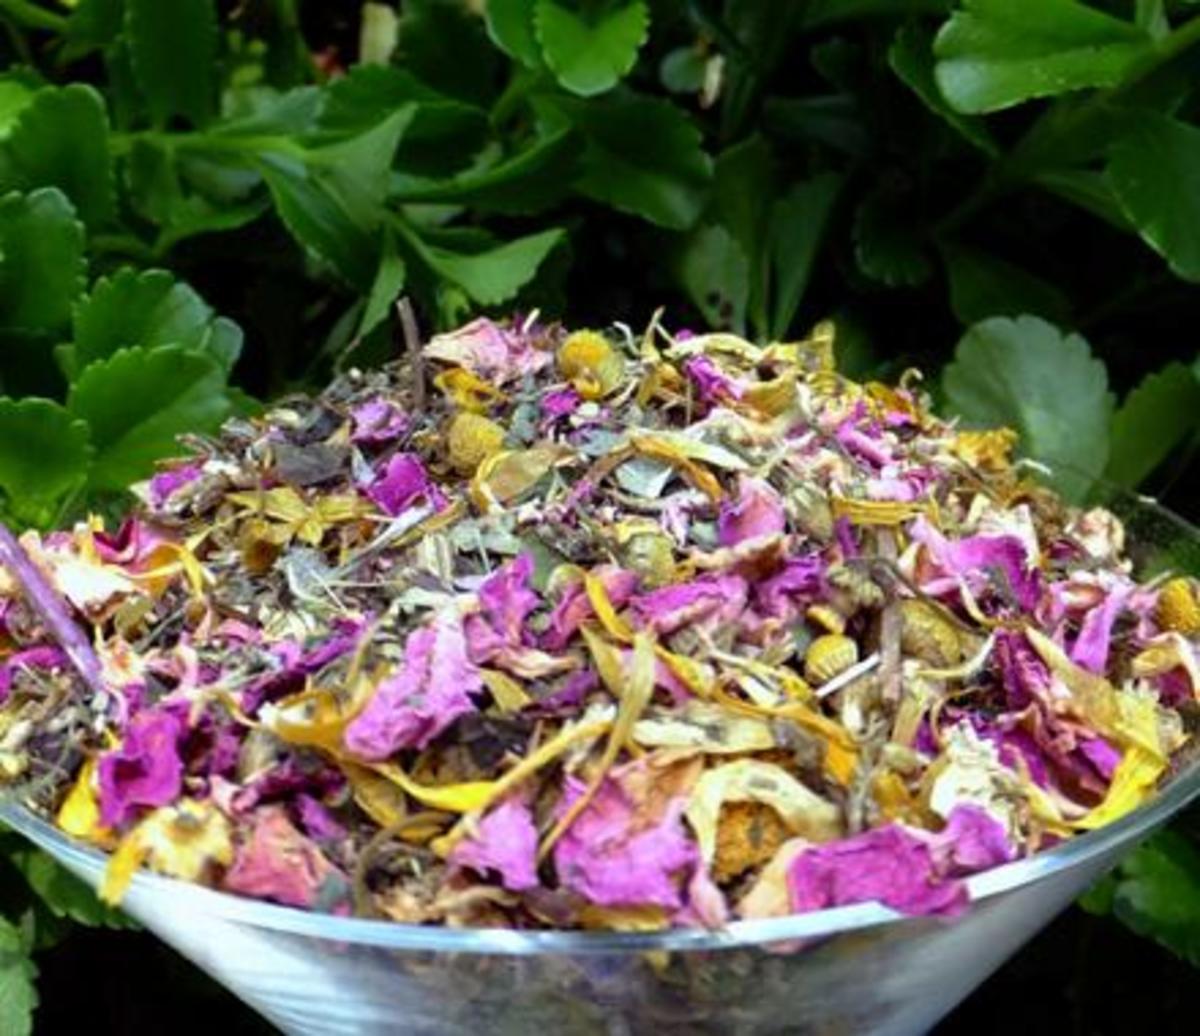 Chagrin Valley Organic Facial Teas